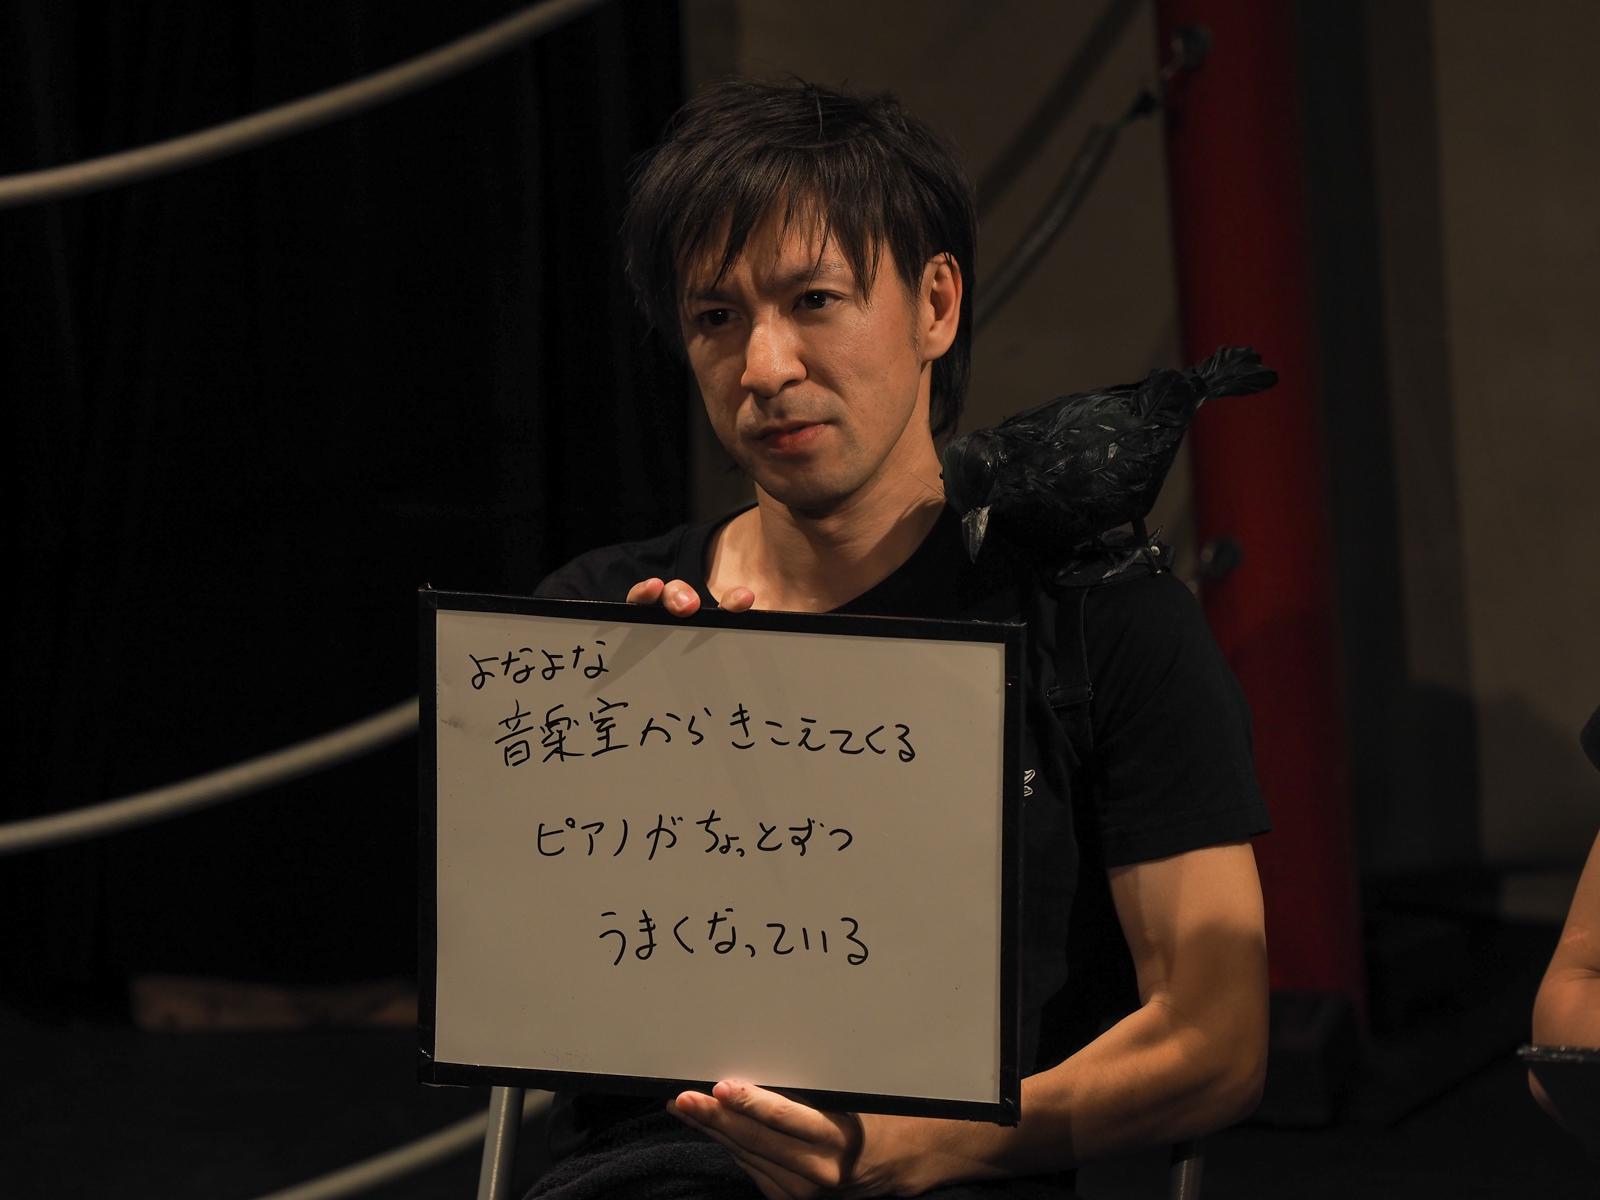 f:id:motomachi24:20161108215209j:plain